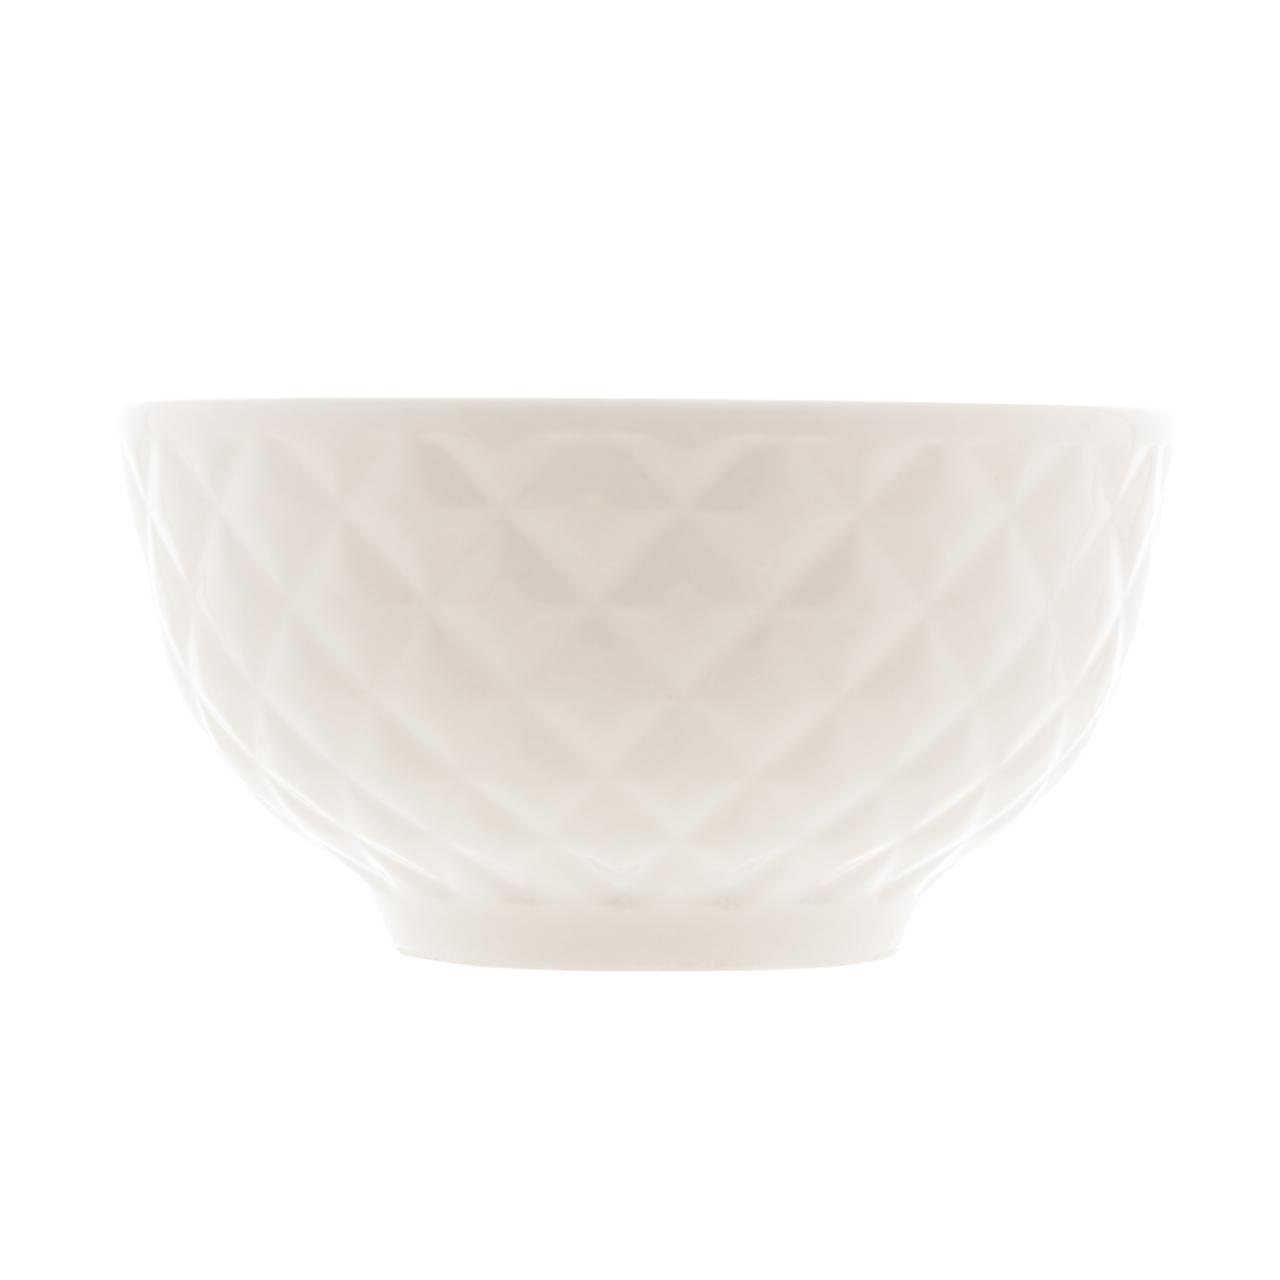 Bowl de porcelana New Bone Diamond Lyor 11,5 cm